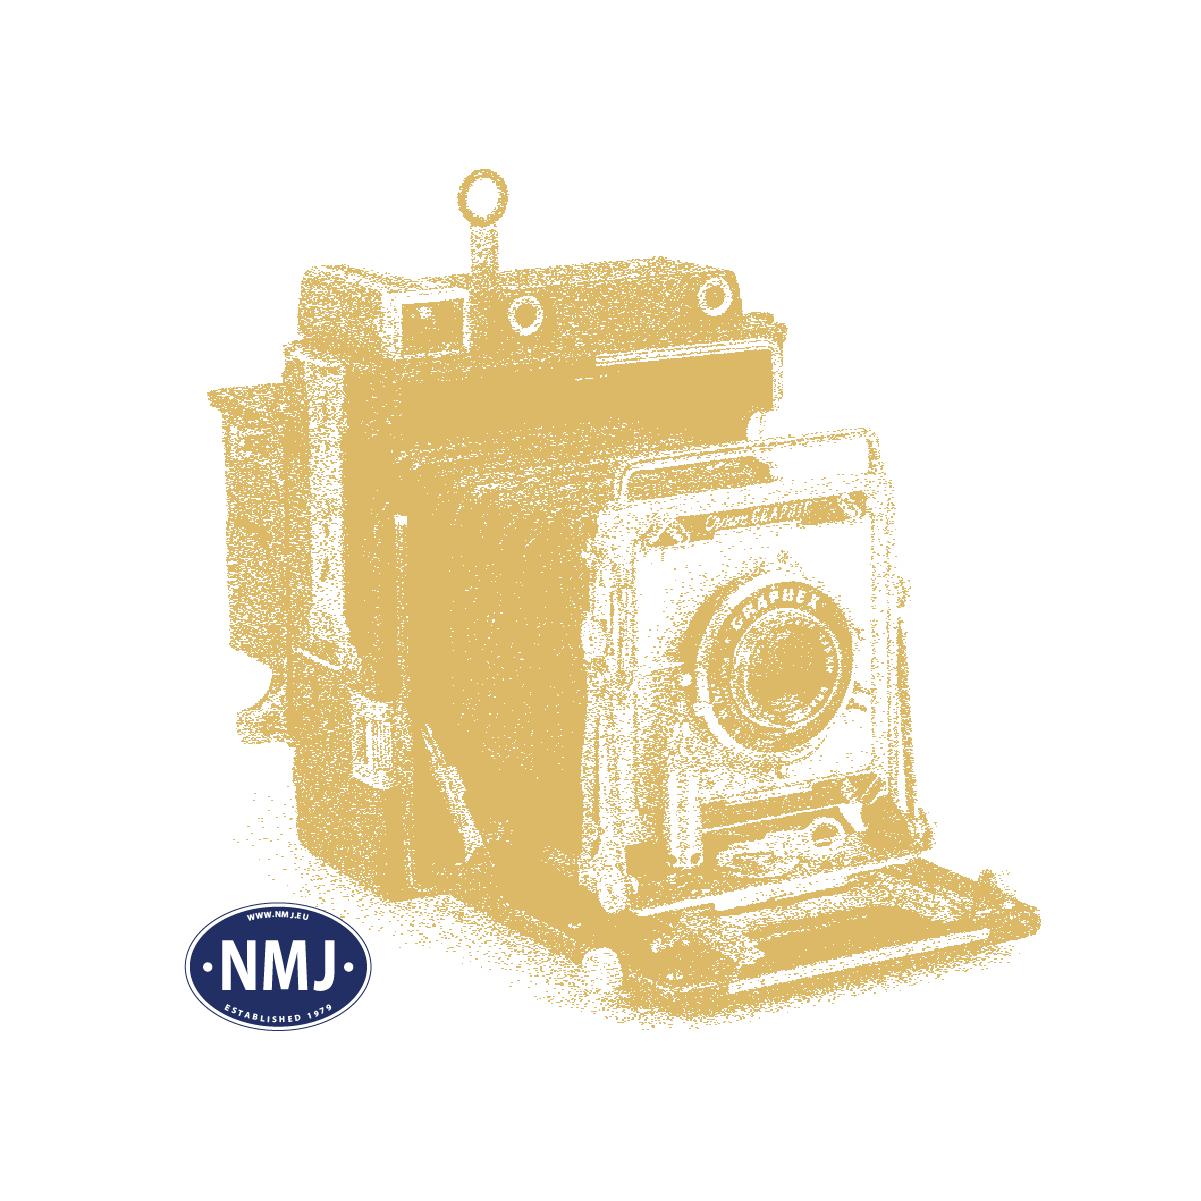 MBR55-1021 - Gressmatte #21, 20 x 30 Cm